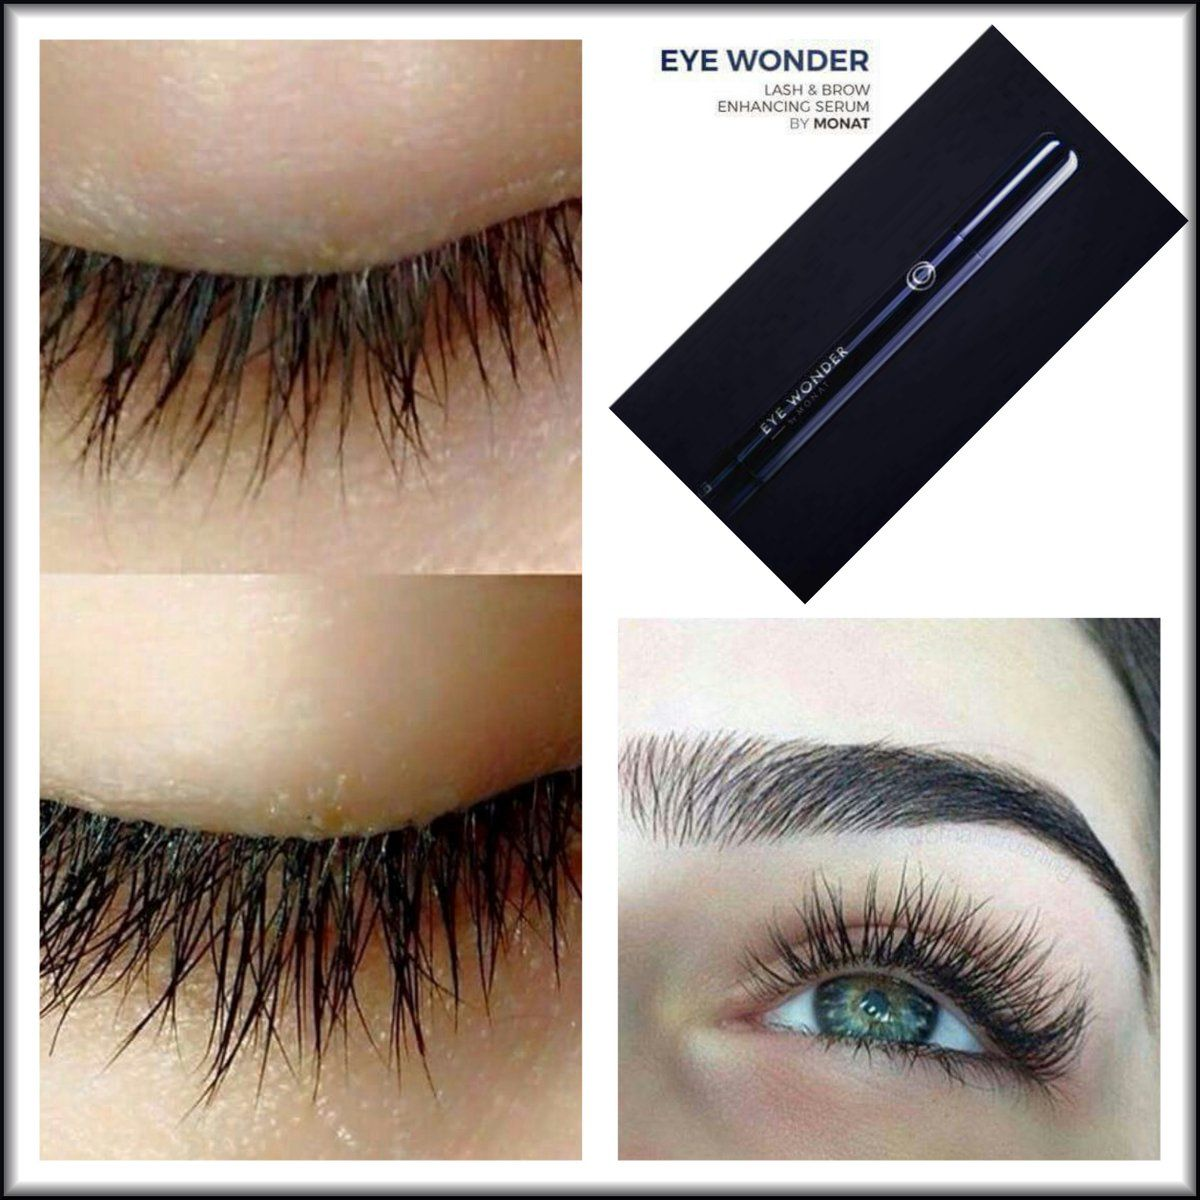 c0cafe9ba25 Monat Eye Wonder Lash & Brow Serum #nofalsies #Capixyl #growlashes ...